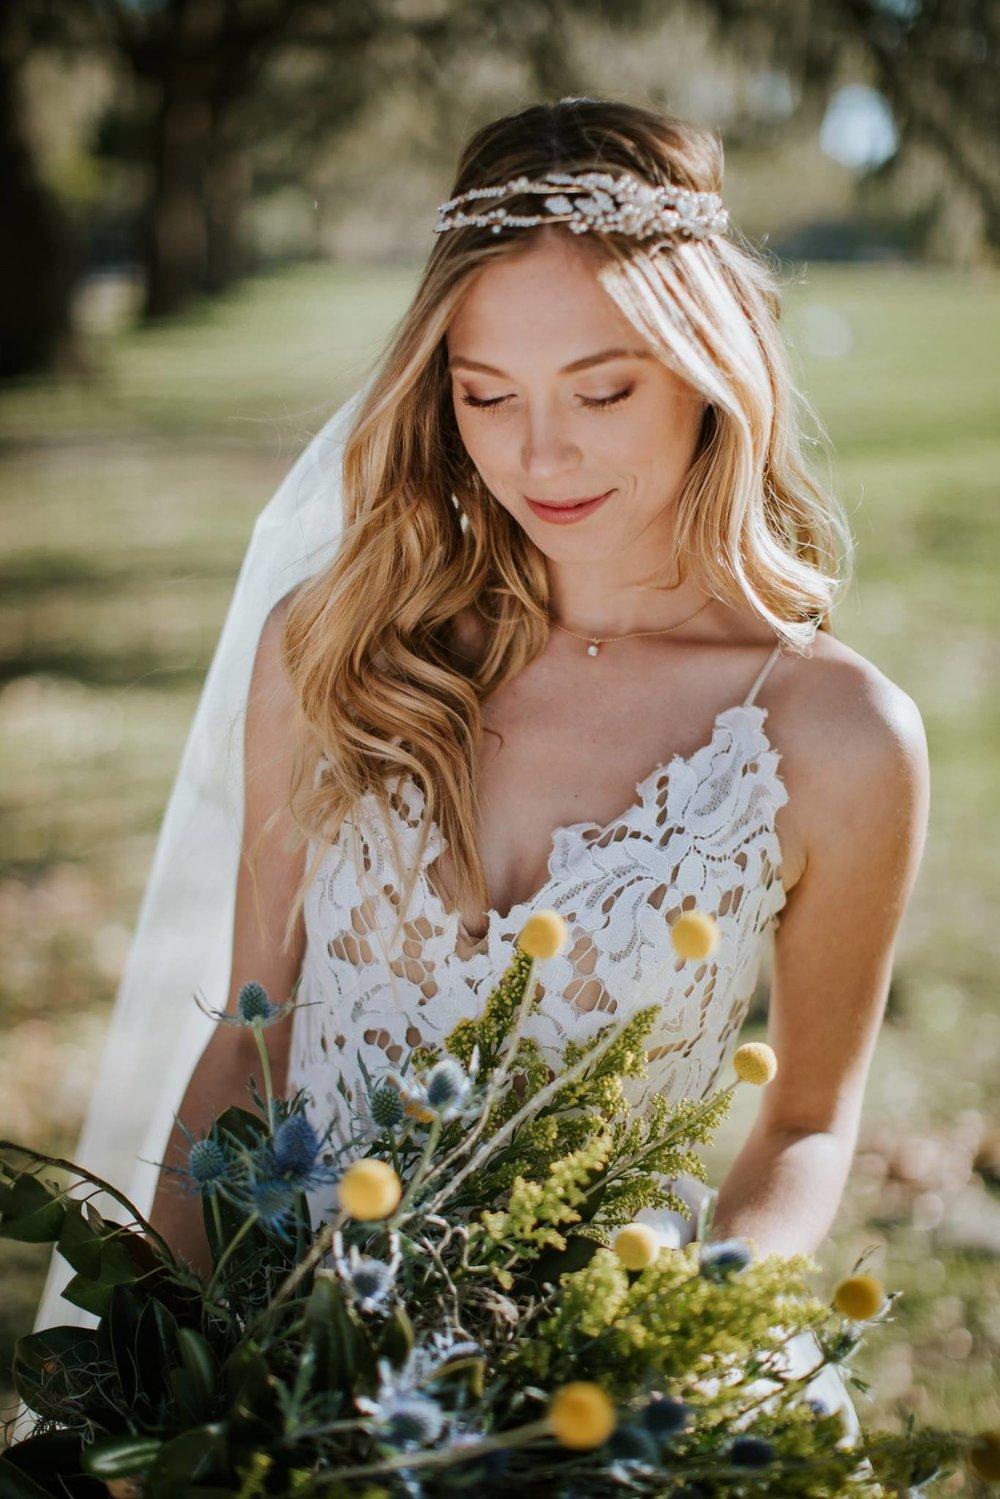 savannah-bridal-shop-five-reasons-to-have-a-fall-wedding-in-savannah-heather-skye-phototgraphy-blush-by-hayley-paige-fall-wedding-trends-9.jpg